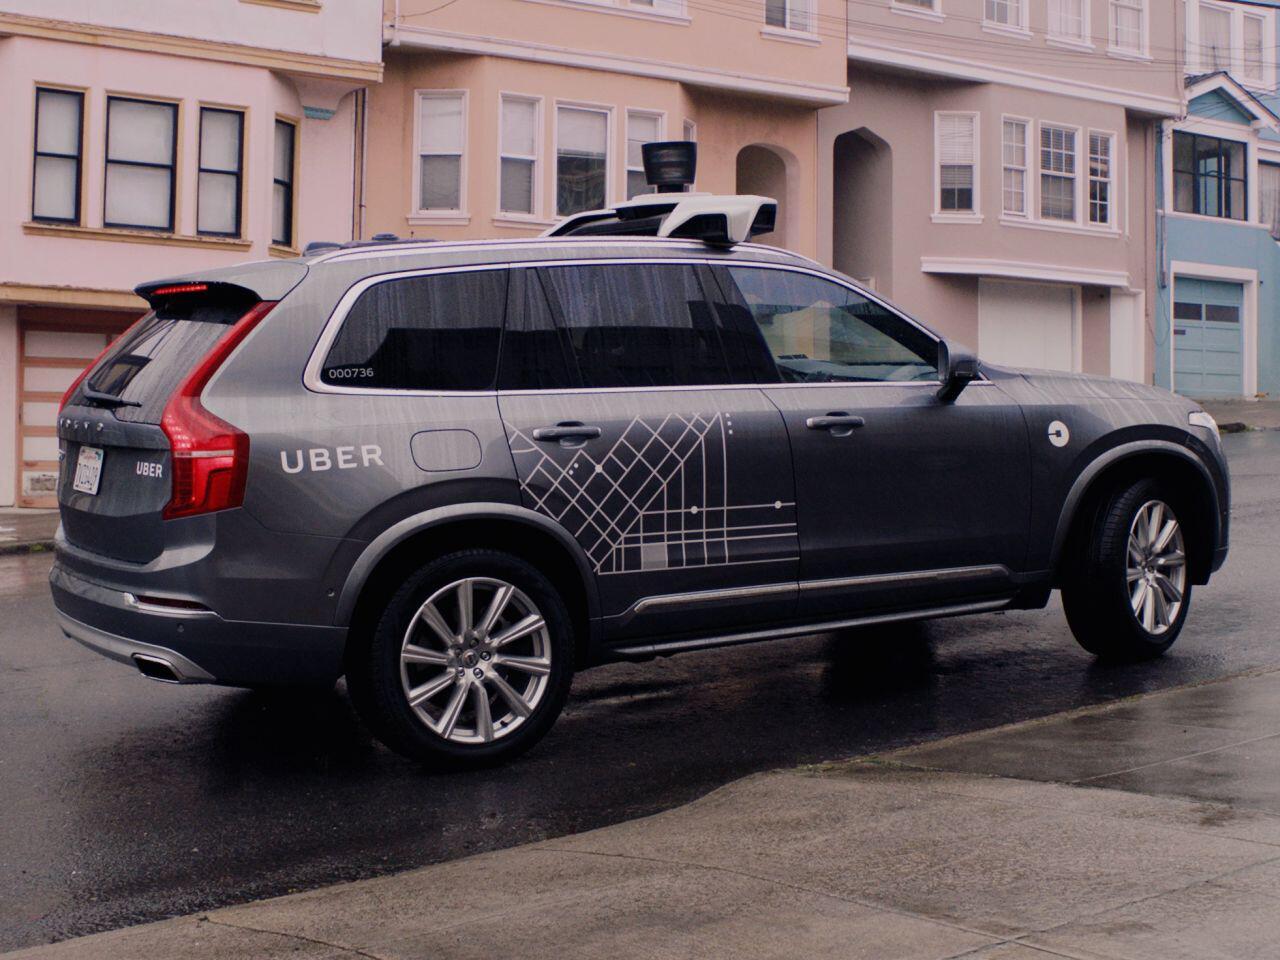 Bild zu Uber-Volvo